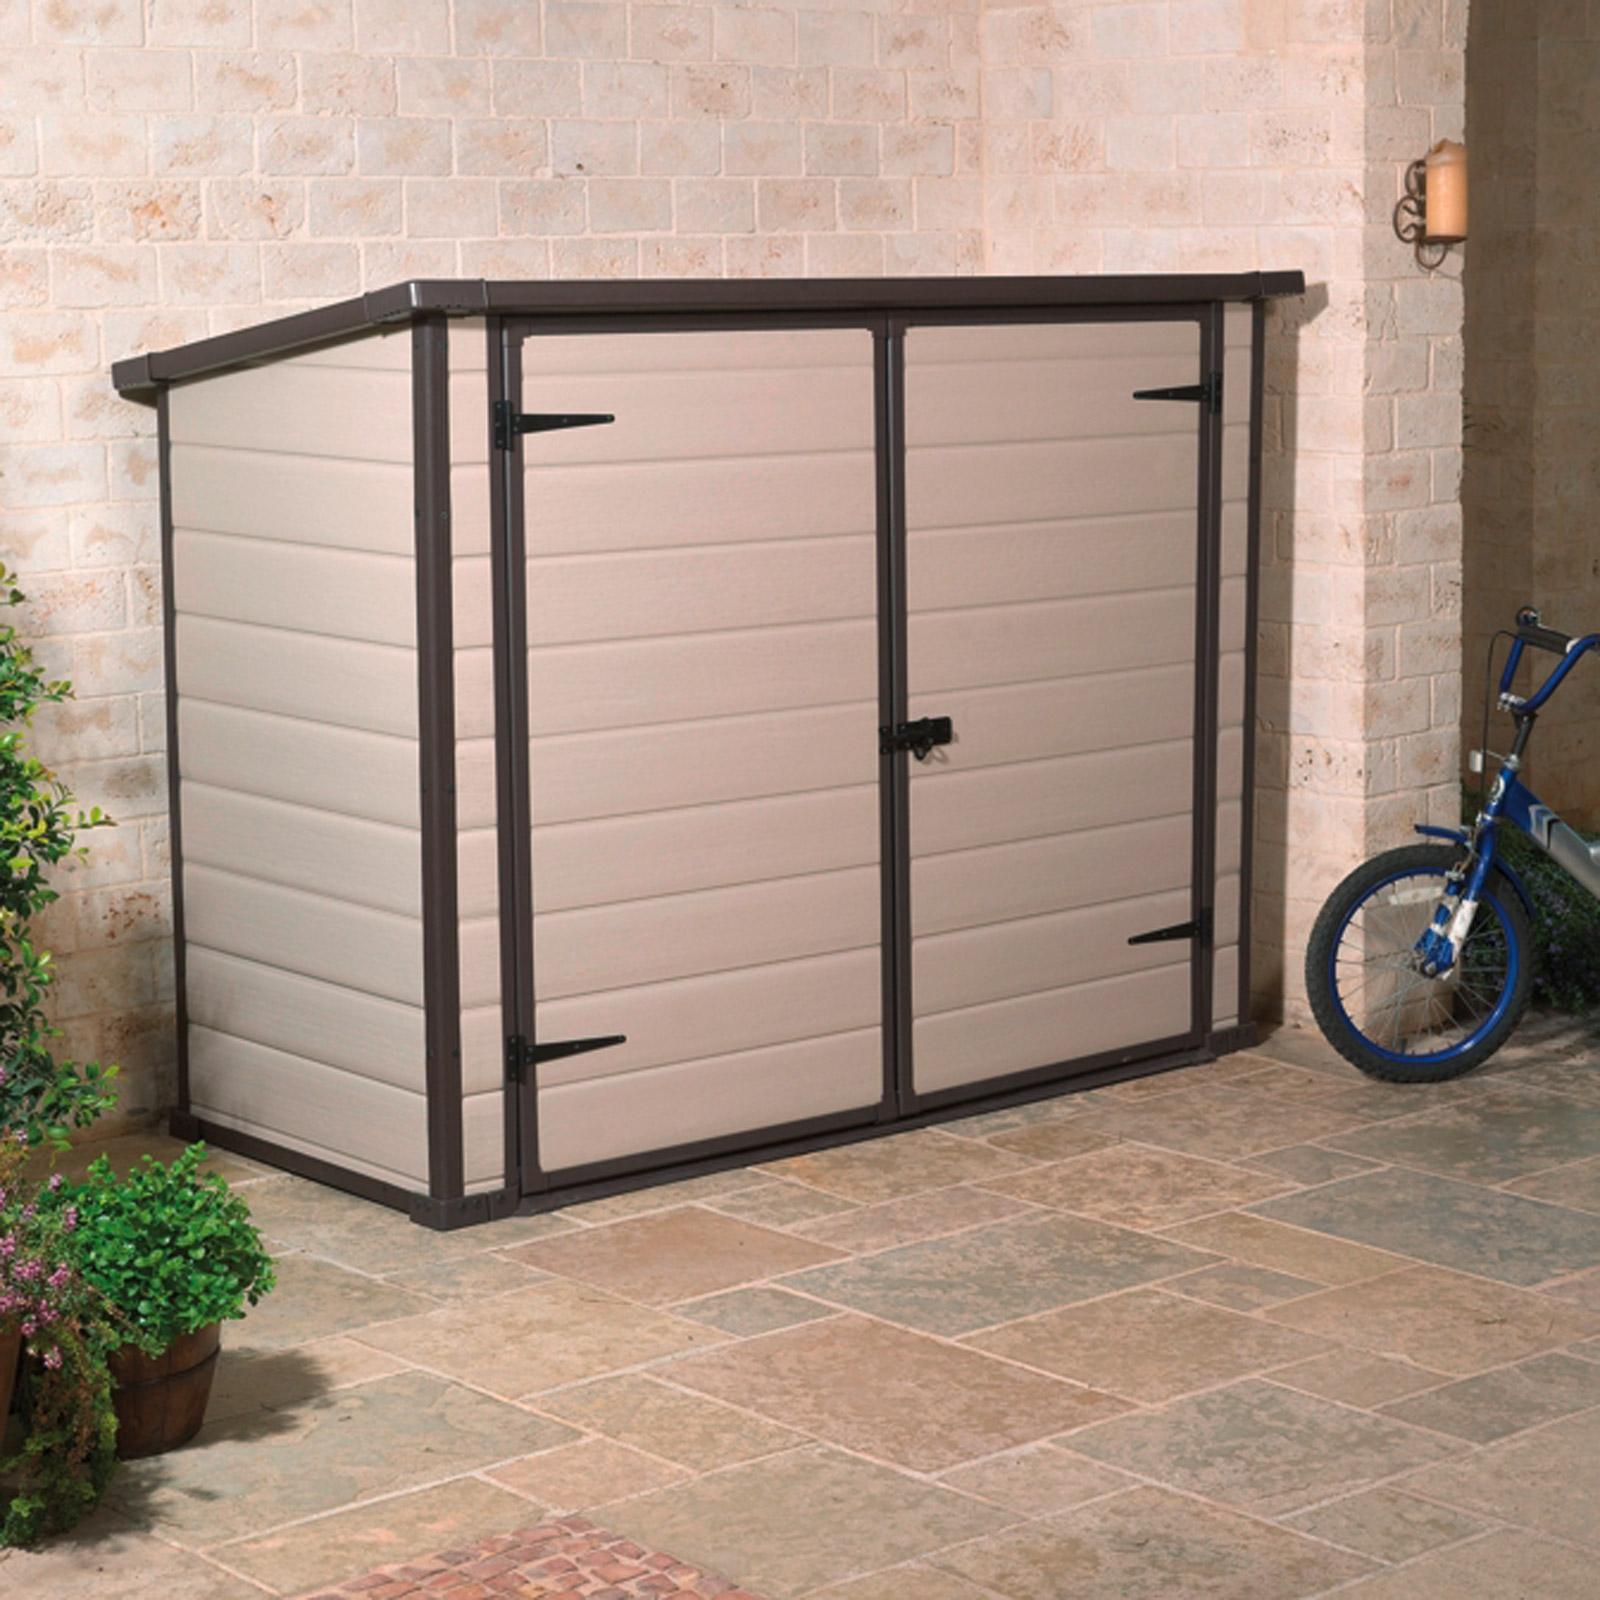 m lltonnenbox universalbox gartenbox fahrradbox polypropylen neu 919794 ebay. Black Bedroom Furniture Sets. Home Design Ideas